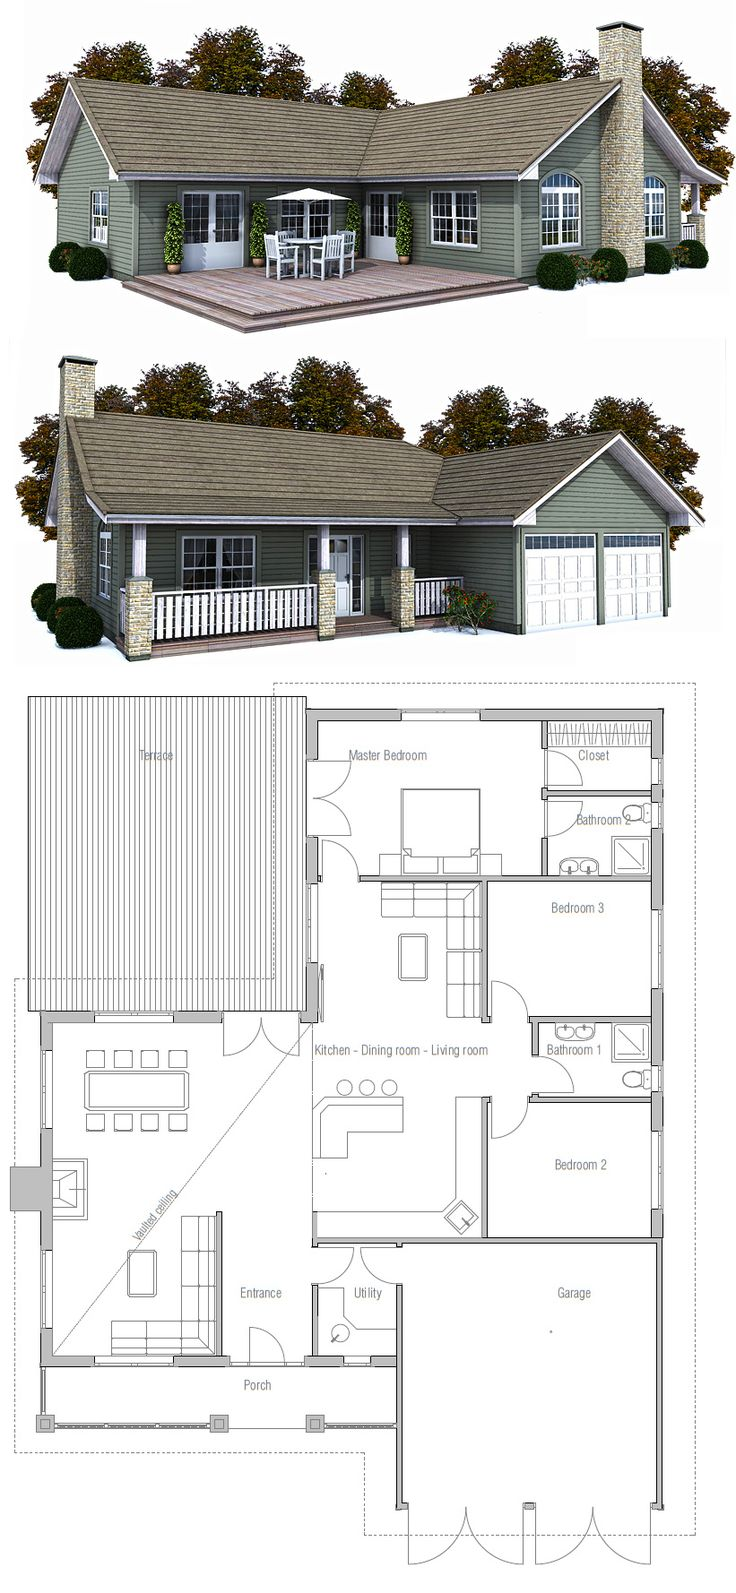 Brilliant 17 Best Ideas About Small House Plans On Pinterest Cabin Plans Largest Home Design Picture Inspirations Pitcheantrous